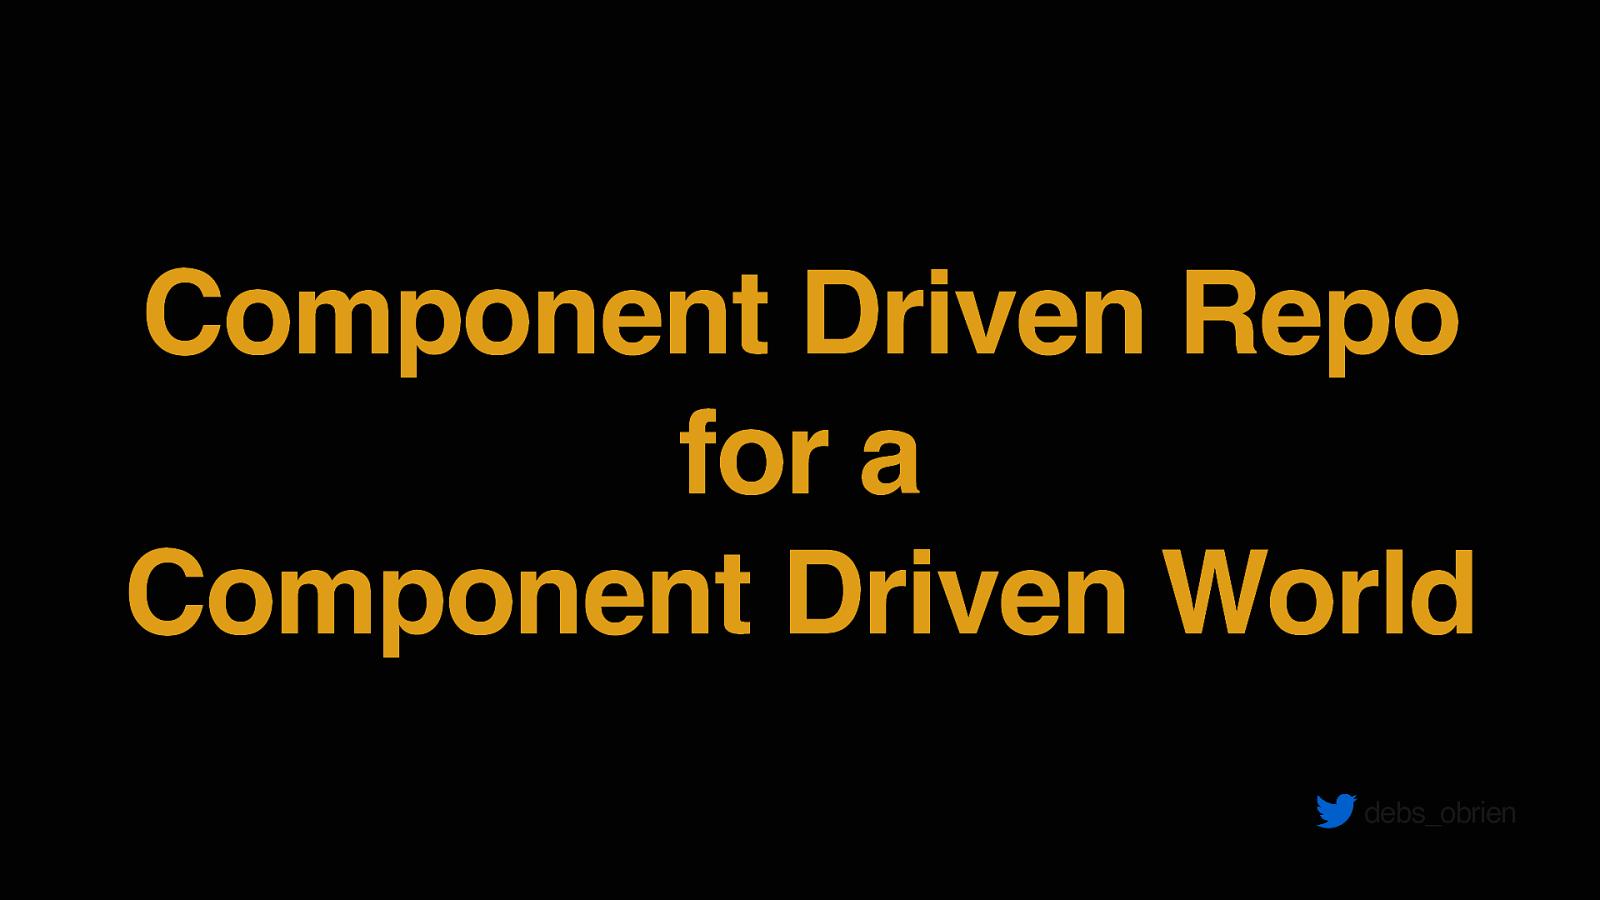 Component Driven Development for Component Driven World by Debbie O'Brien